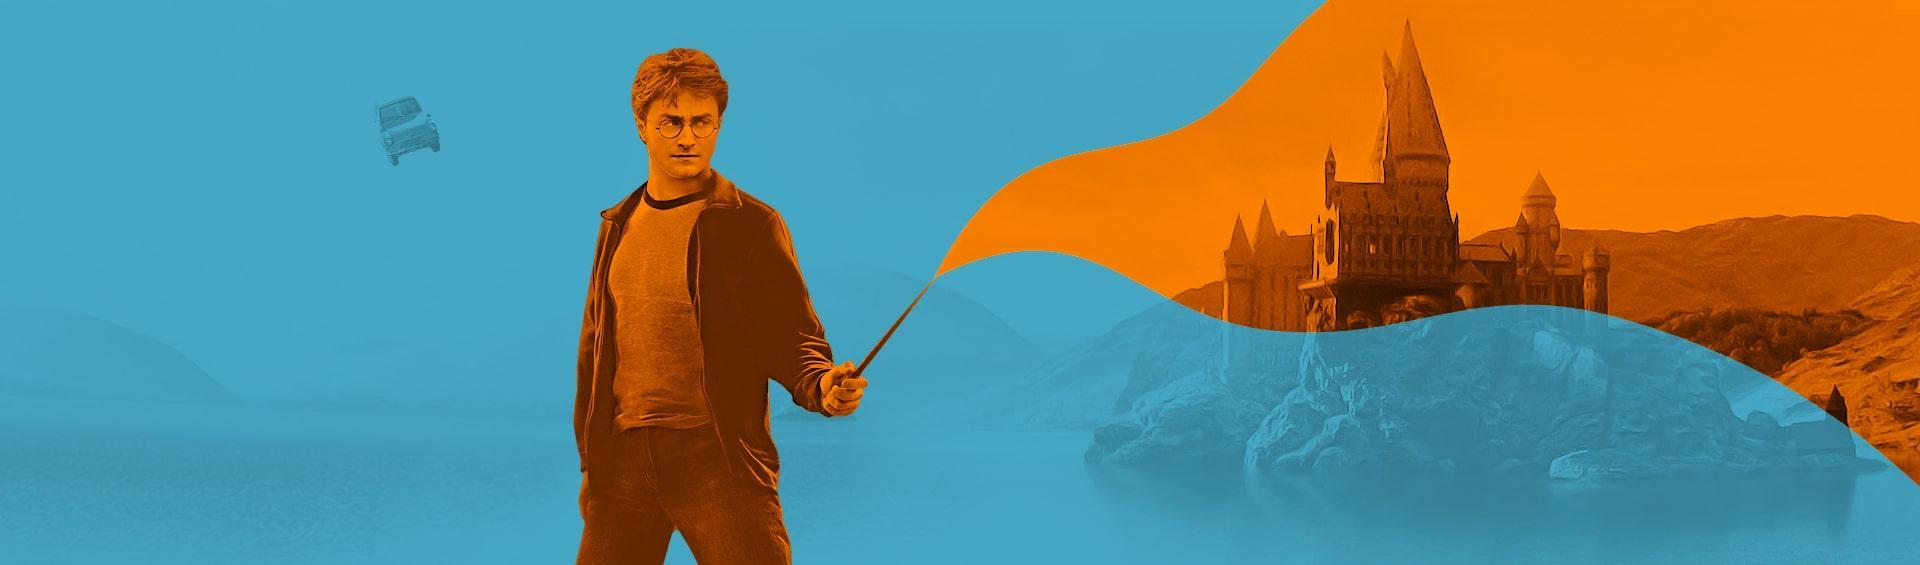 Гарри Поттер итайна писем. Сильнали ваша email-магия?